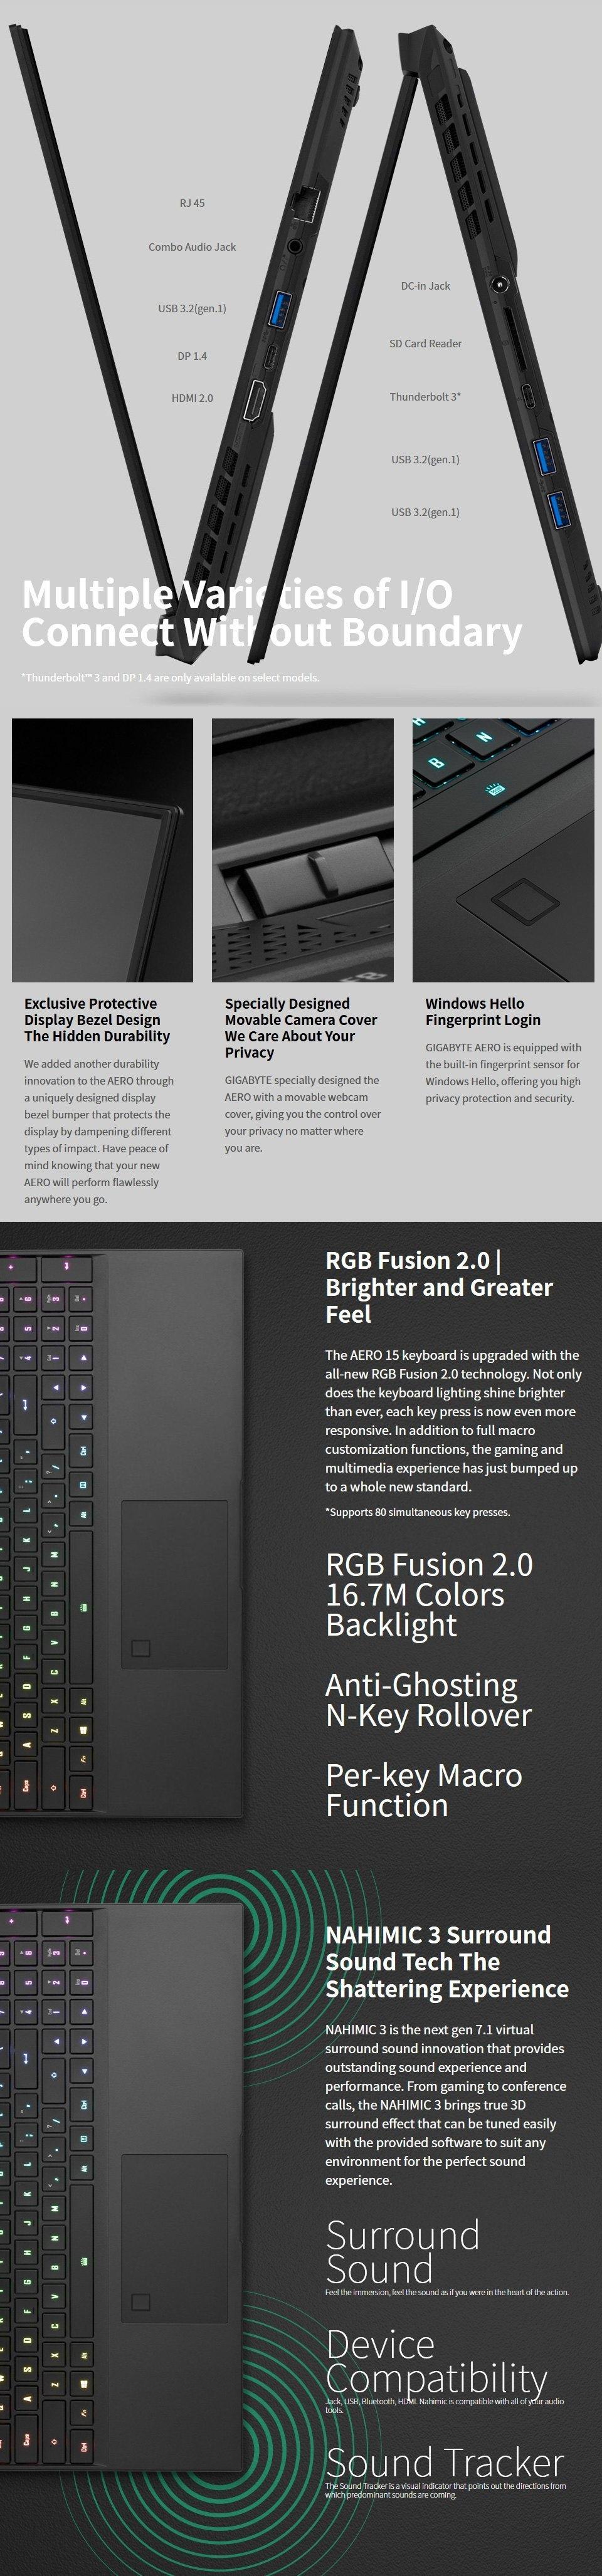 Gigabyte AERO 15 Core i7 RTX 2080 Super 15.6in OLED UHD Laptop features 5